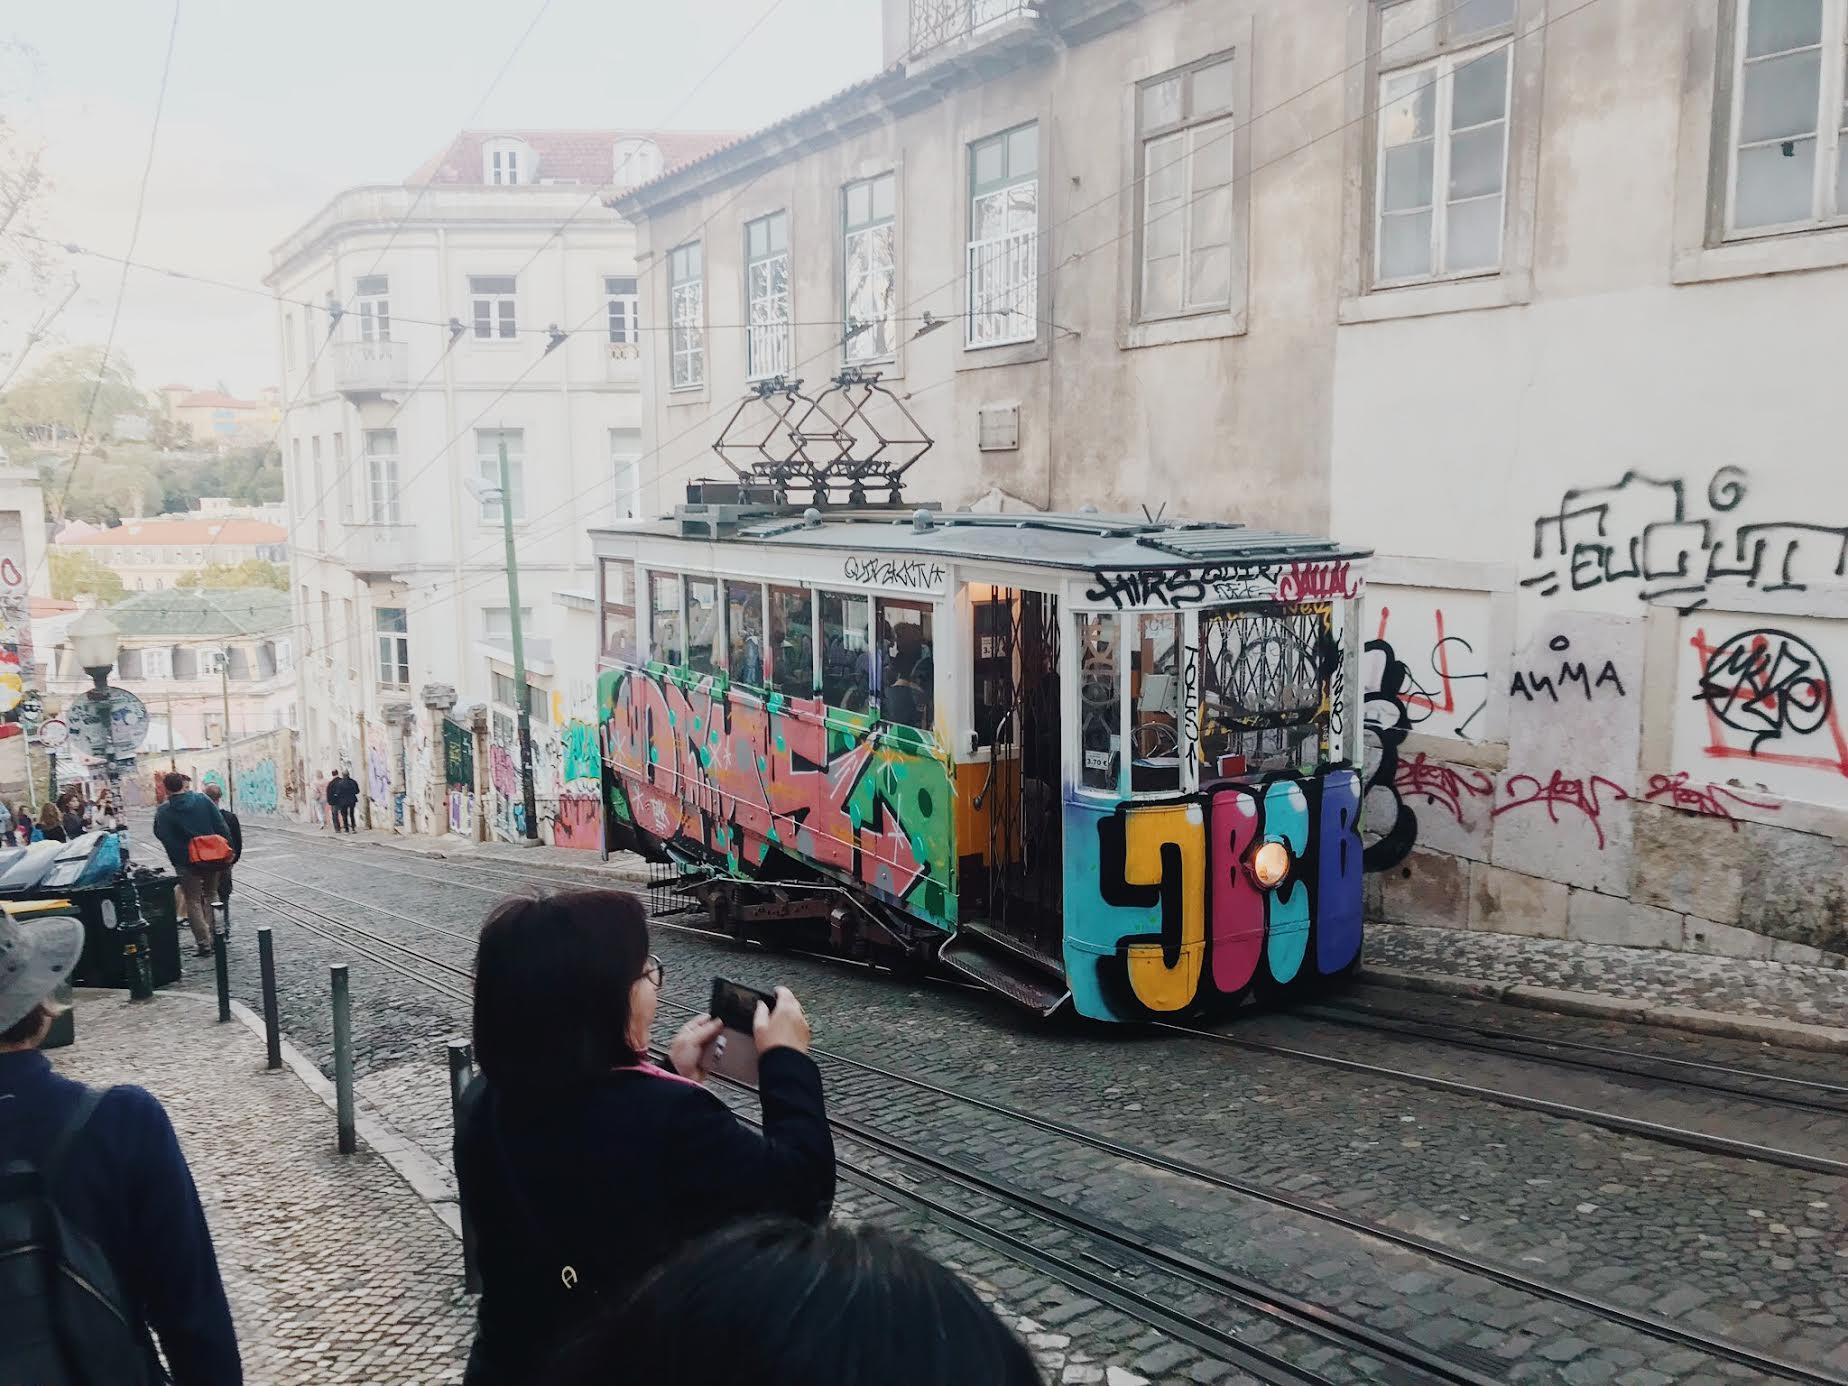 Muslim-travel-guide-Lisbon-travel-tips-tram